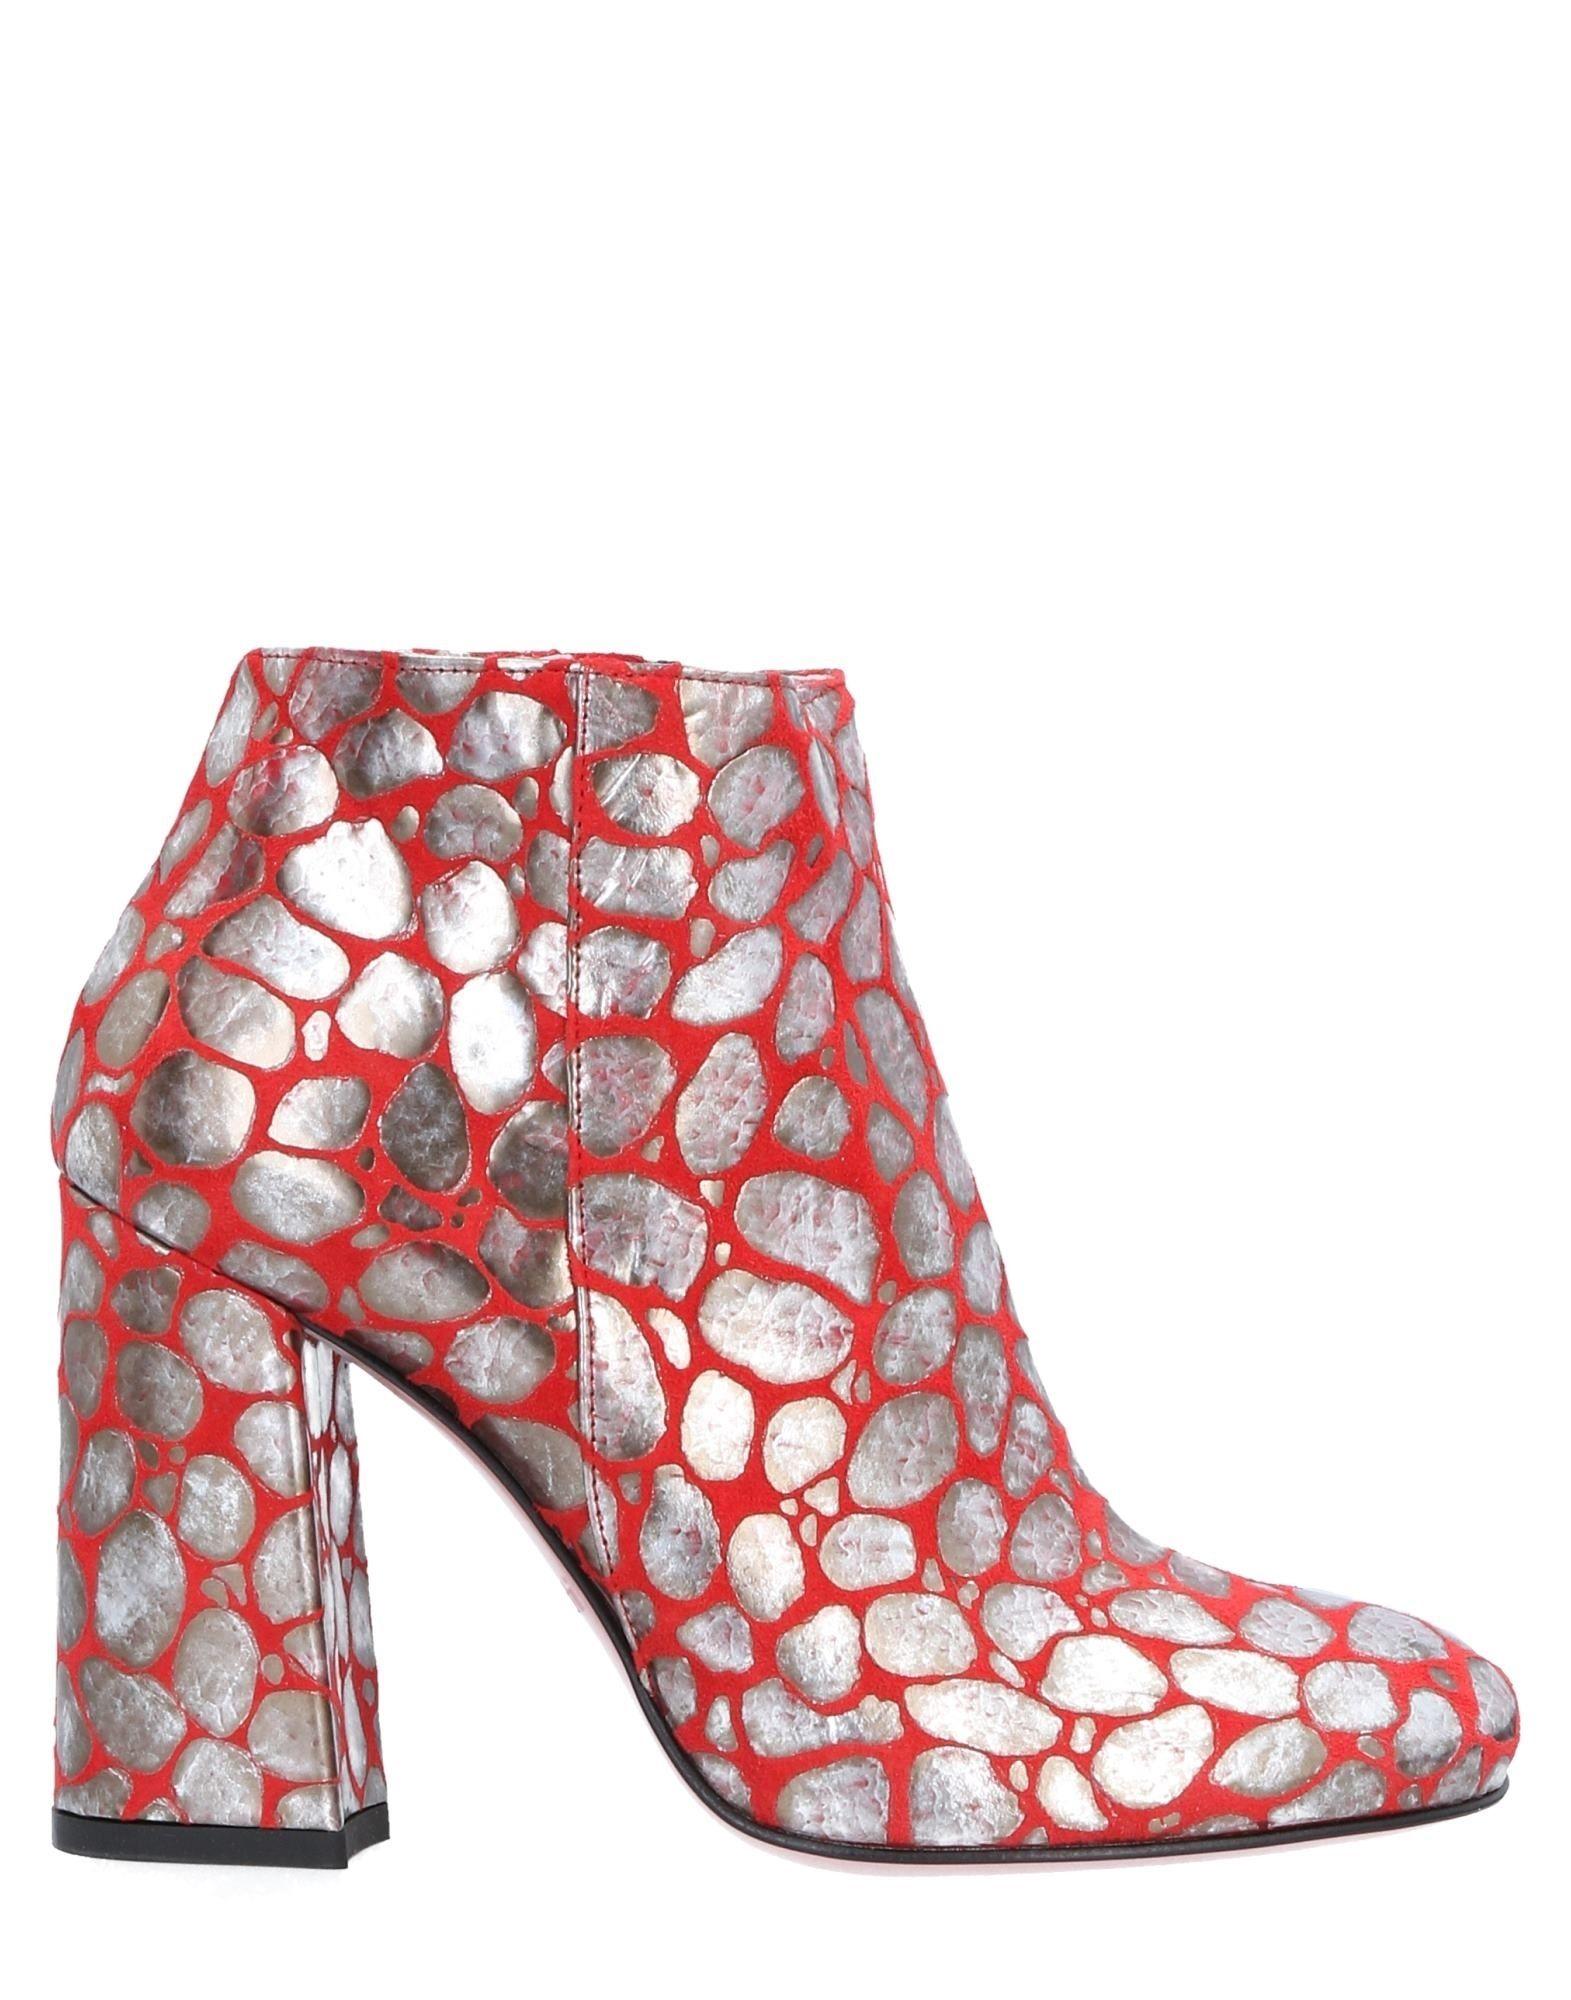 Tipe Neue E Tacchi Stiefelette Damen  11517072ON Neue Tipe Schuhe 020319